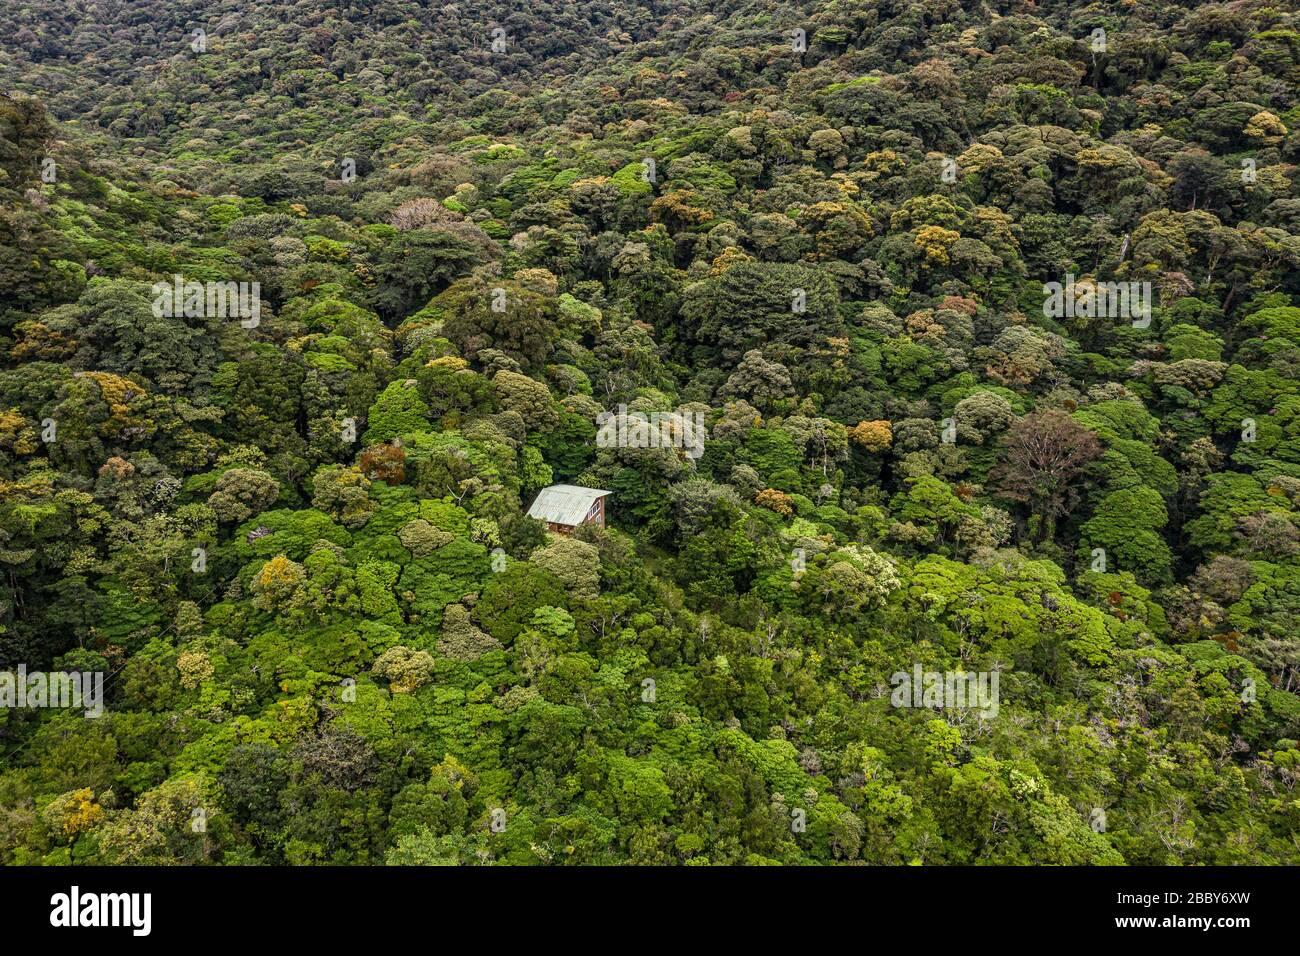 Vista Aerea De La Reserva Biologica Bosque Nuboso Monteverde Provincia De Puntarenas Costa Rica Fotografia De Stock Alamy